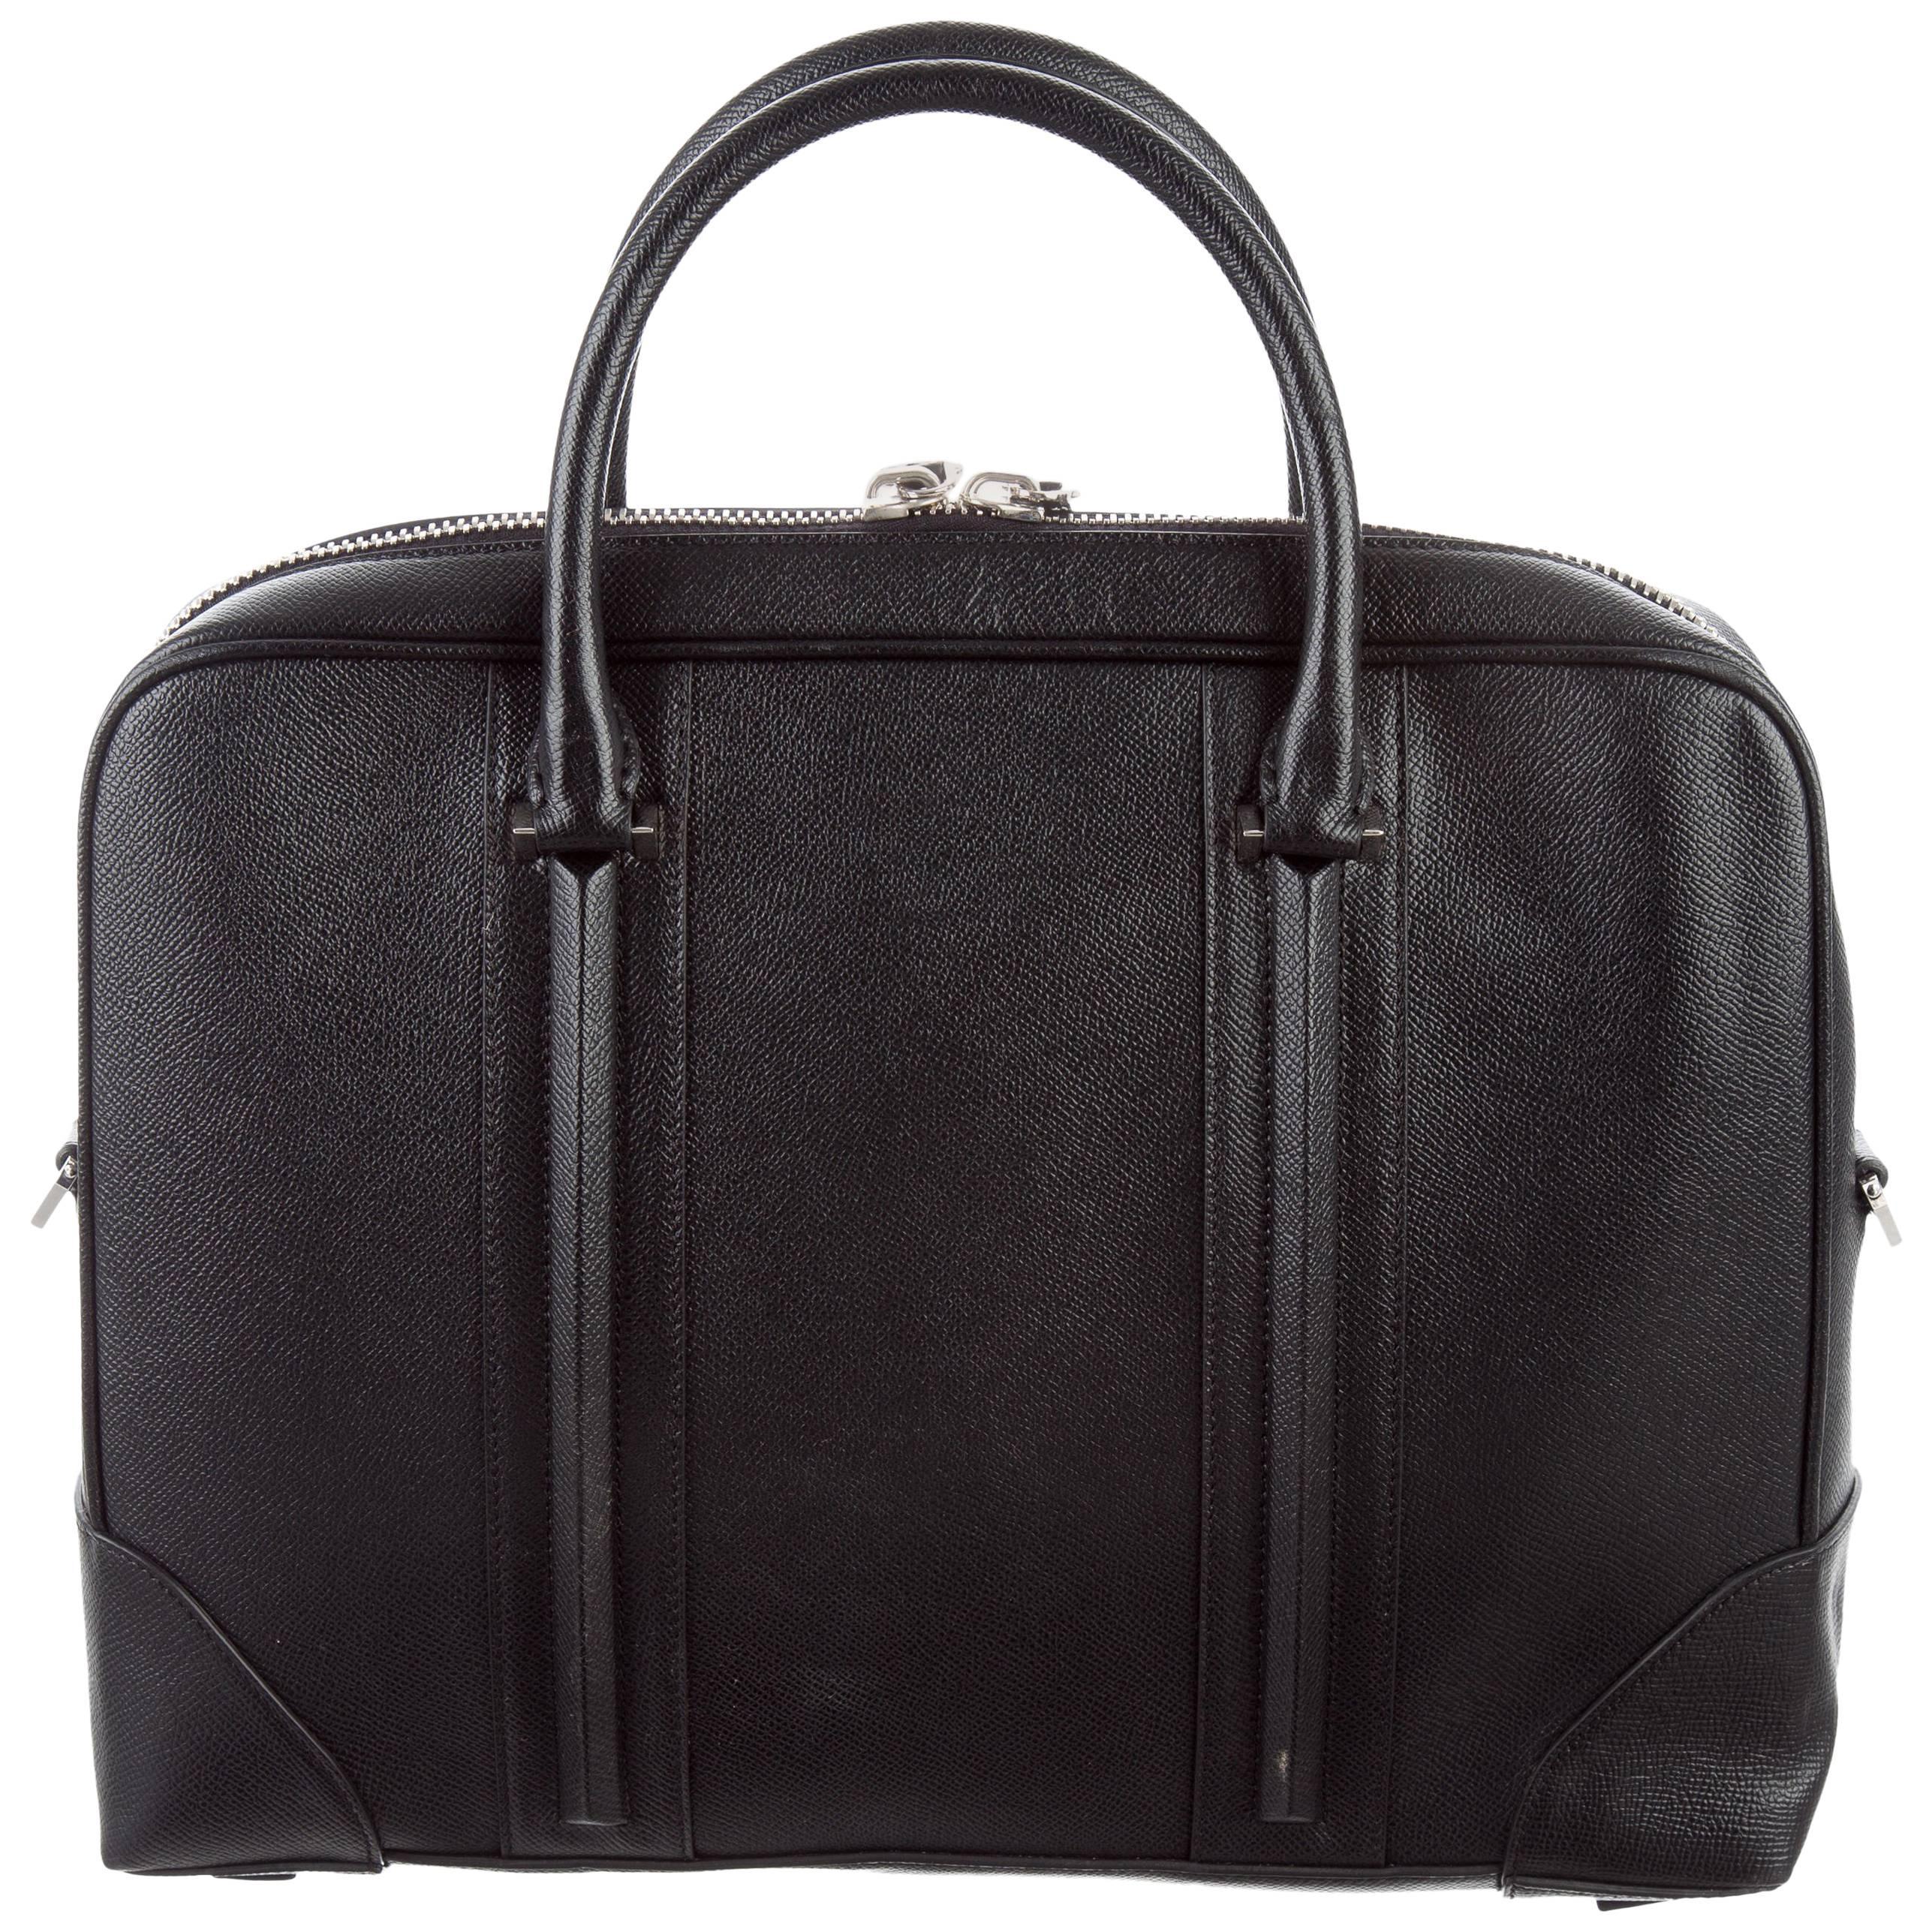 Givenchy Top Handle Handbag, Small Bag, Black, Leather, 2017, one size